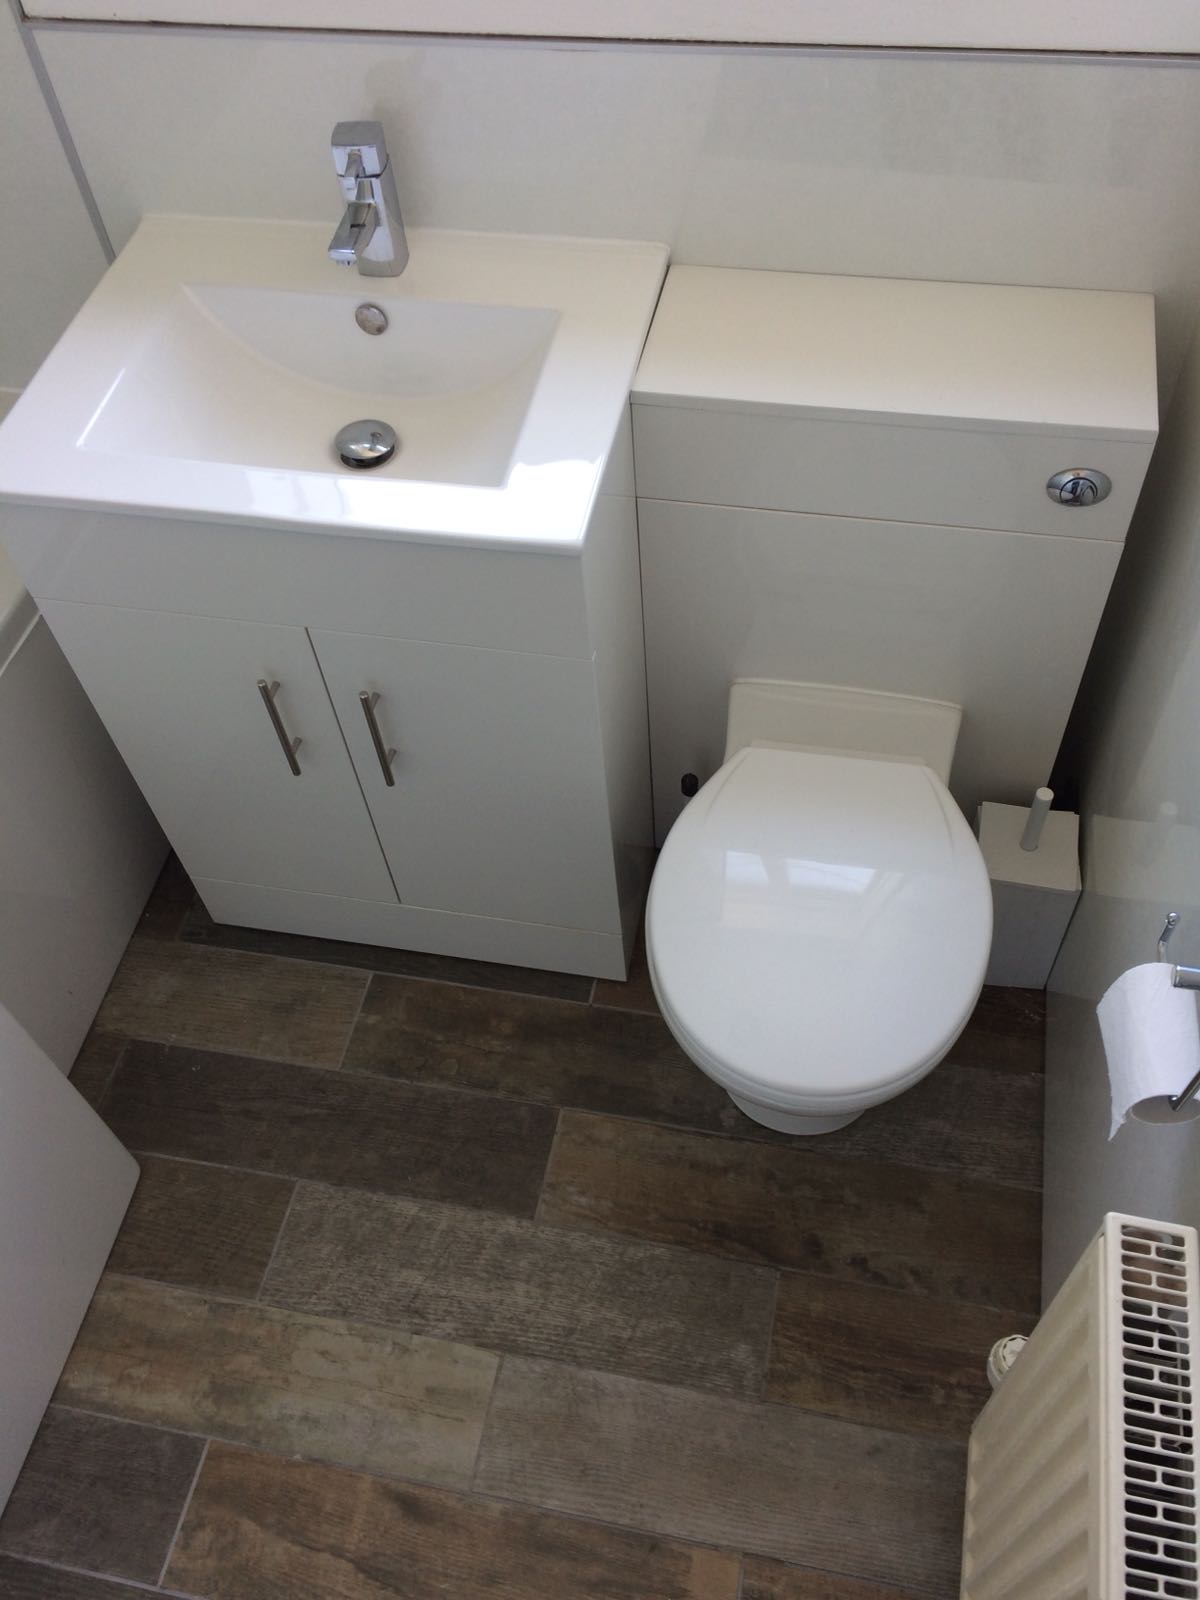 225 Inchkeith Drive, Dunfermline Bathroom